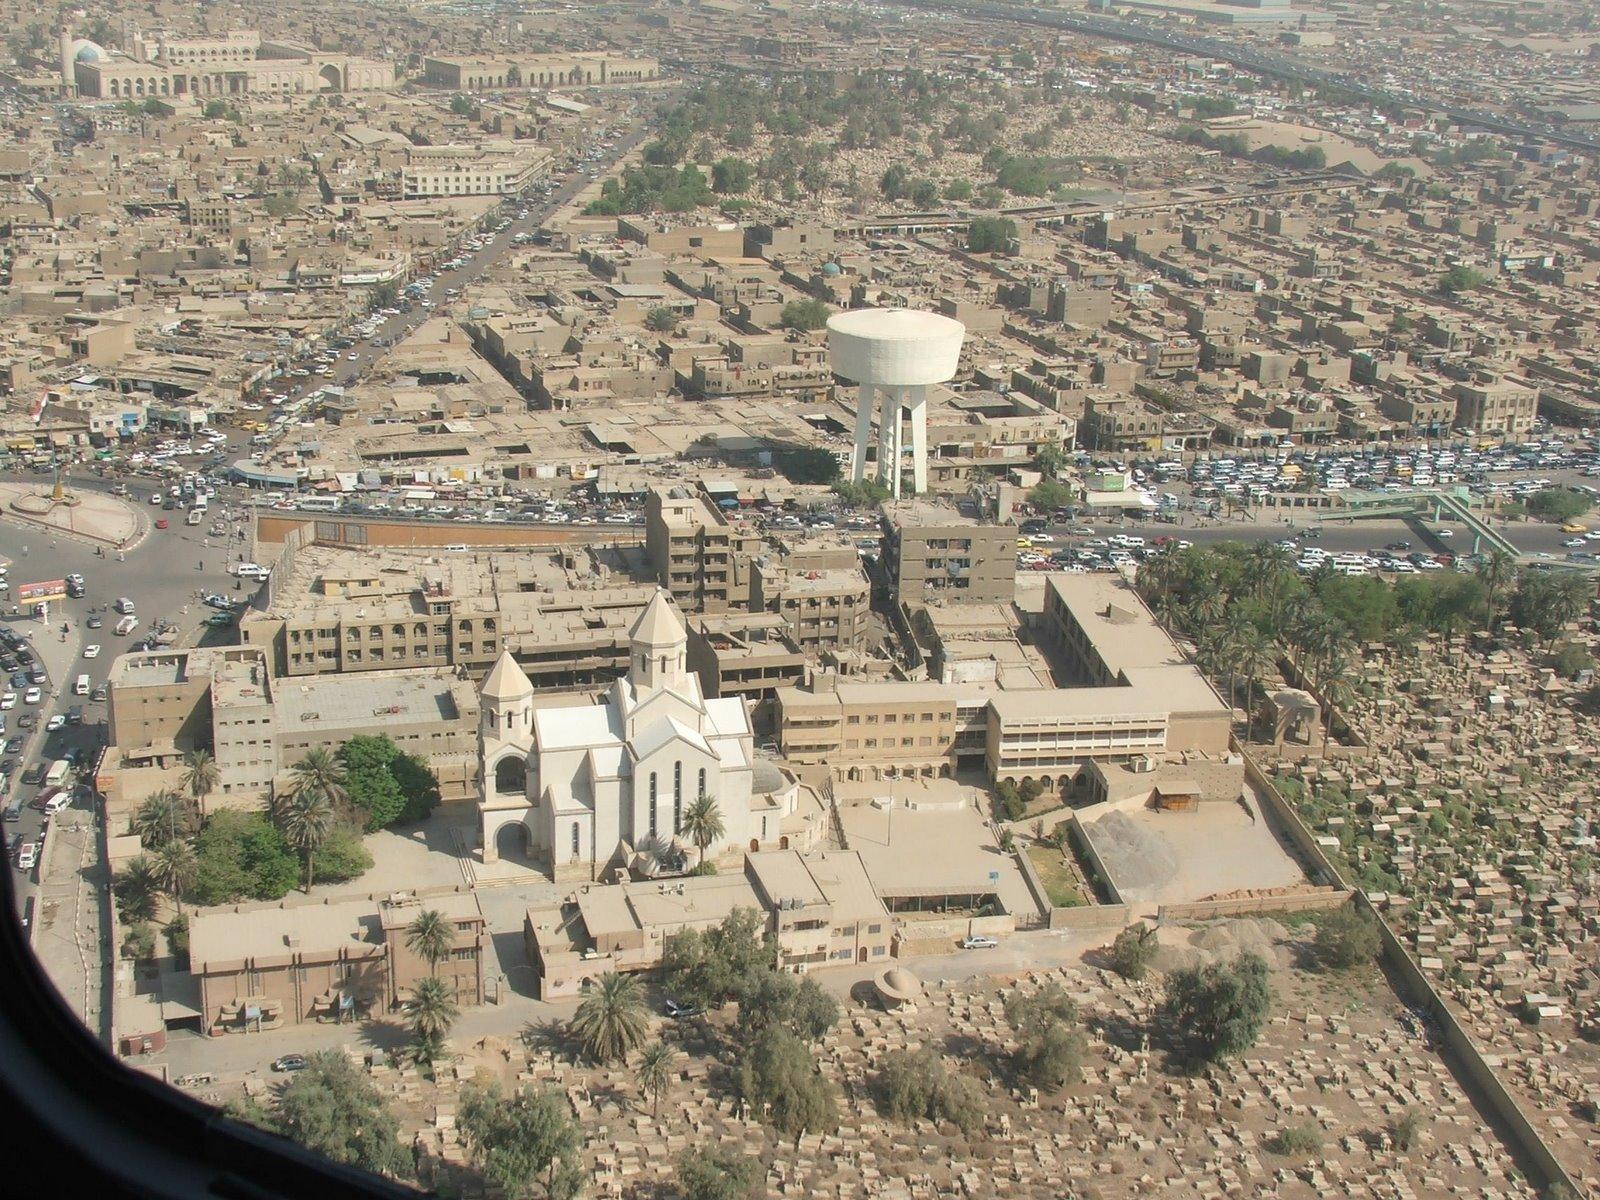 72fed11c5 اهدي هذه الصورة لكاتدرائية القديس غريغور المنوّر في بغداد